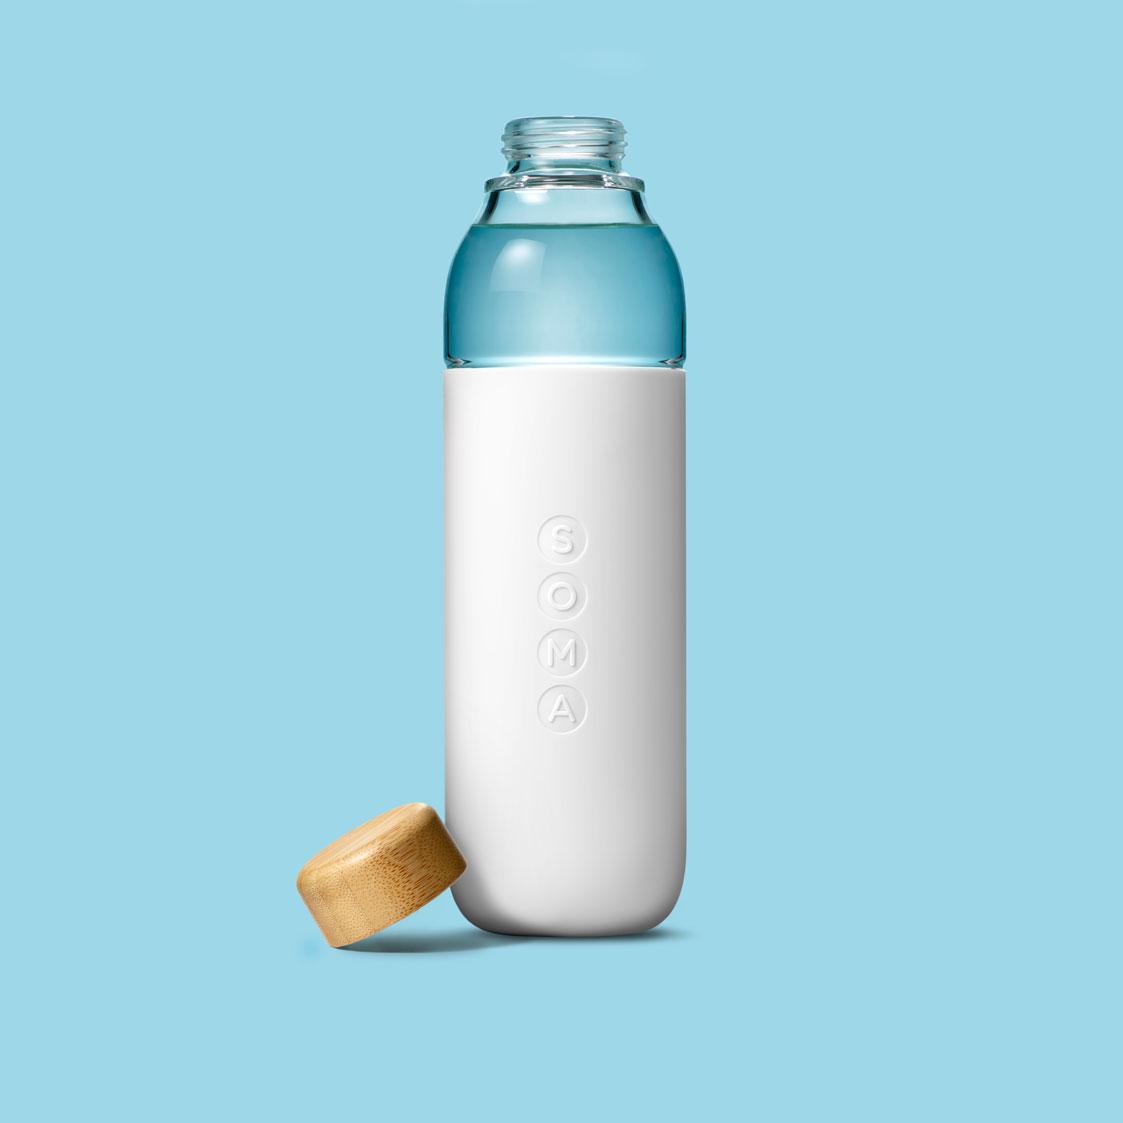 BottleInBlueCircle.jpg